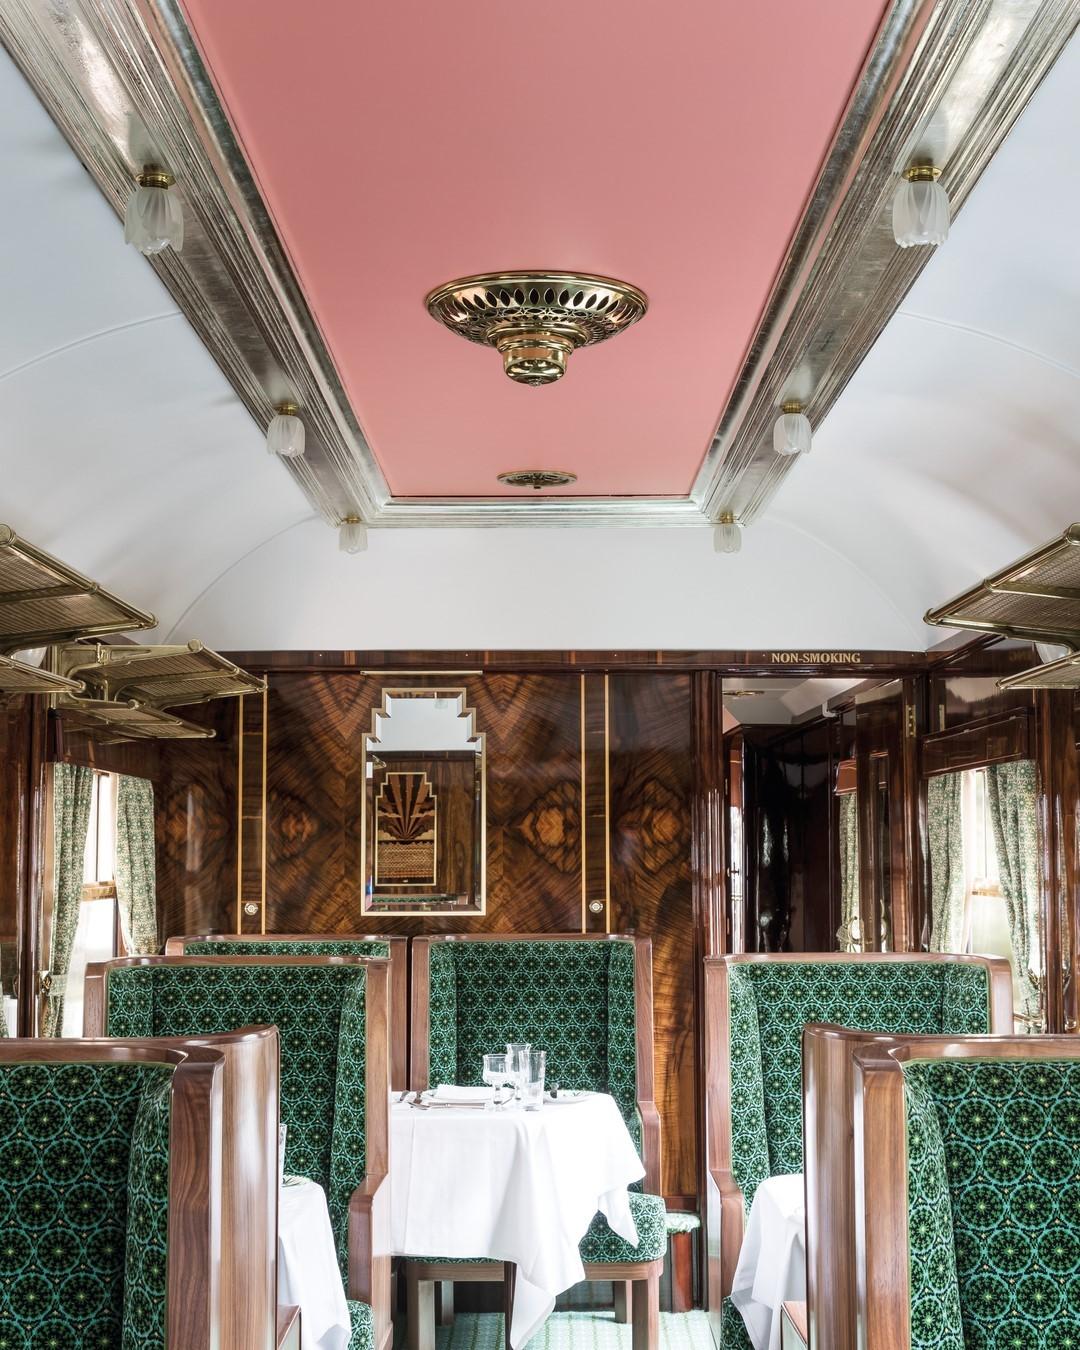 Уэс Андерсон оформил интерьер вагона в поезде Belmond British Pullman (фото 1)